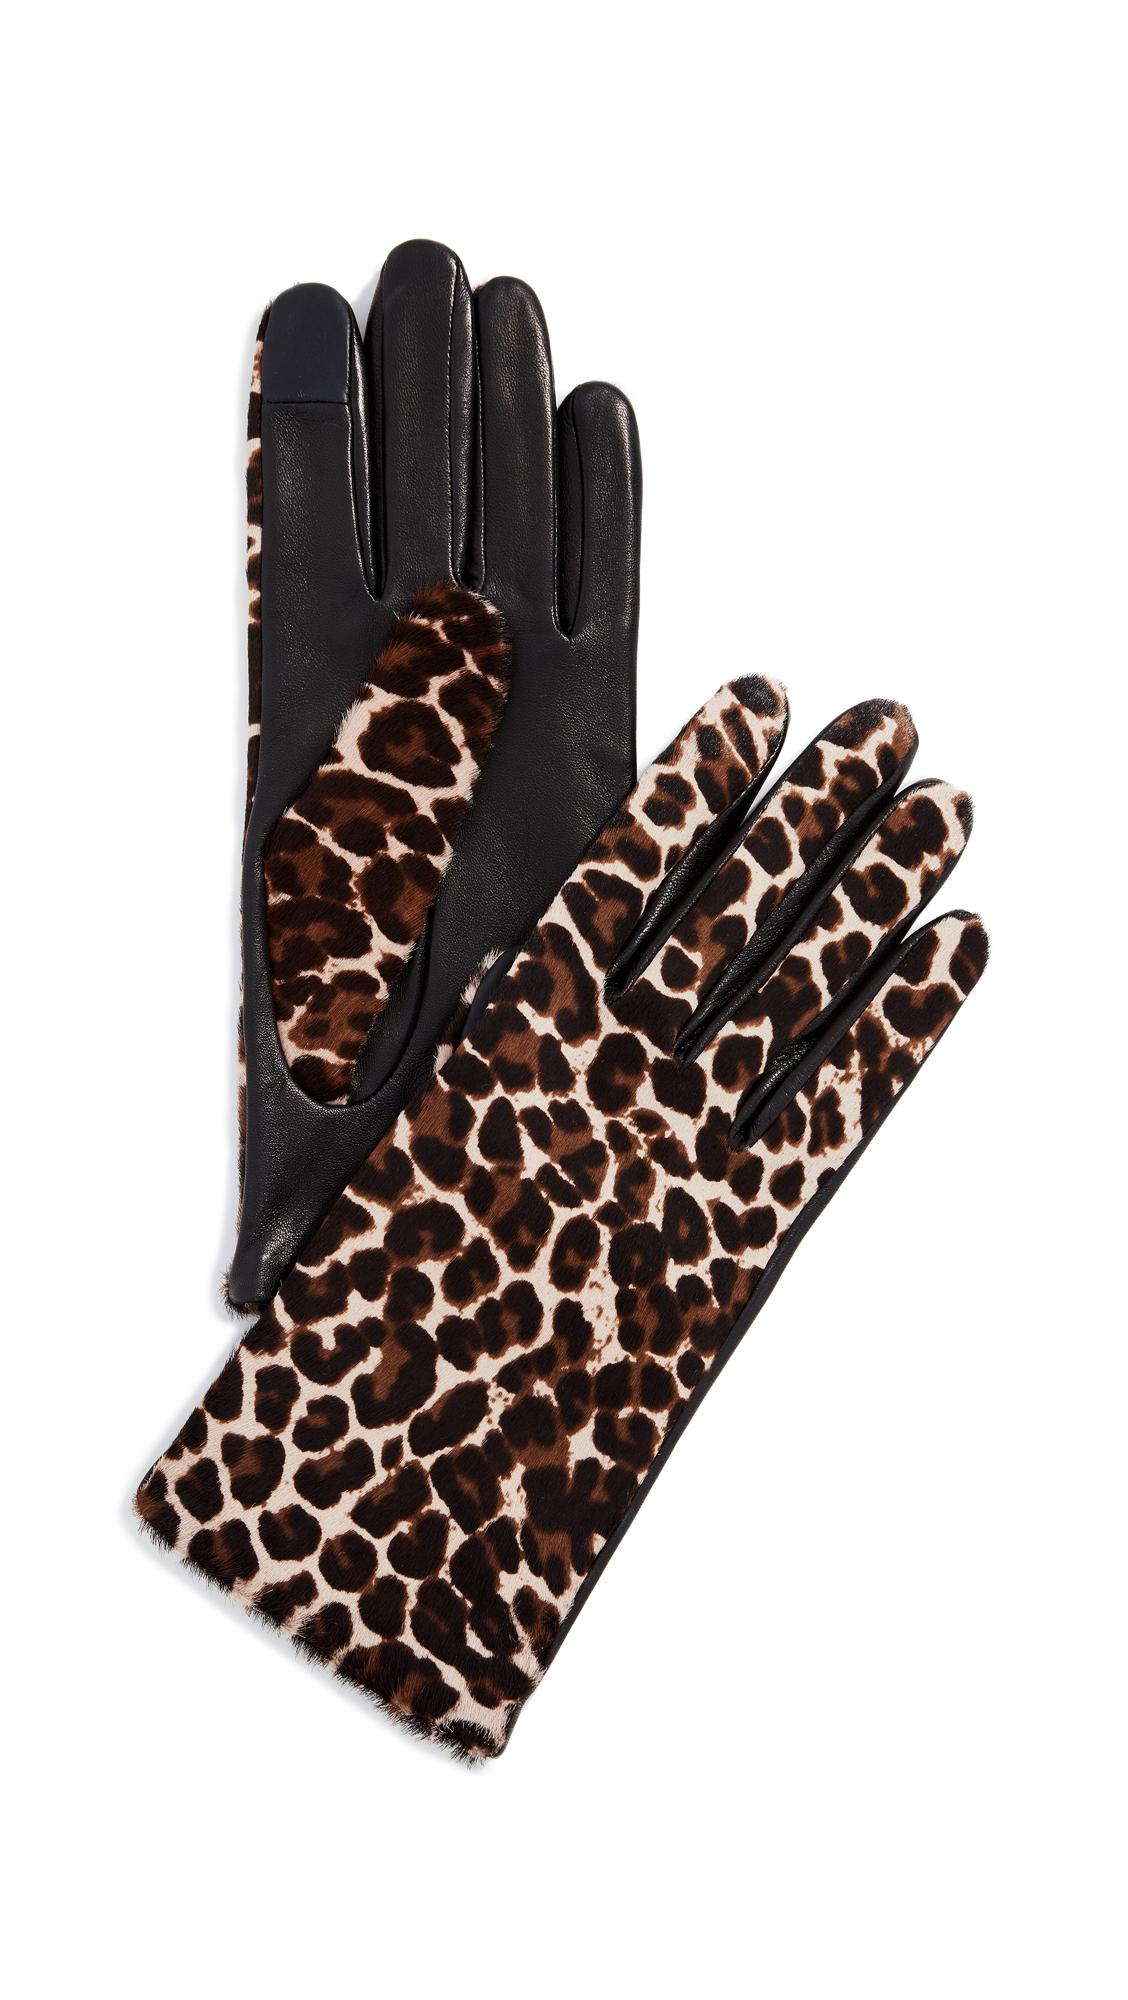 AGNELLE Chloe Calf Gloves, Leopard